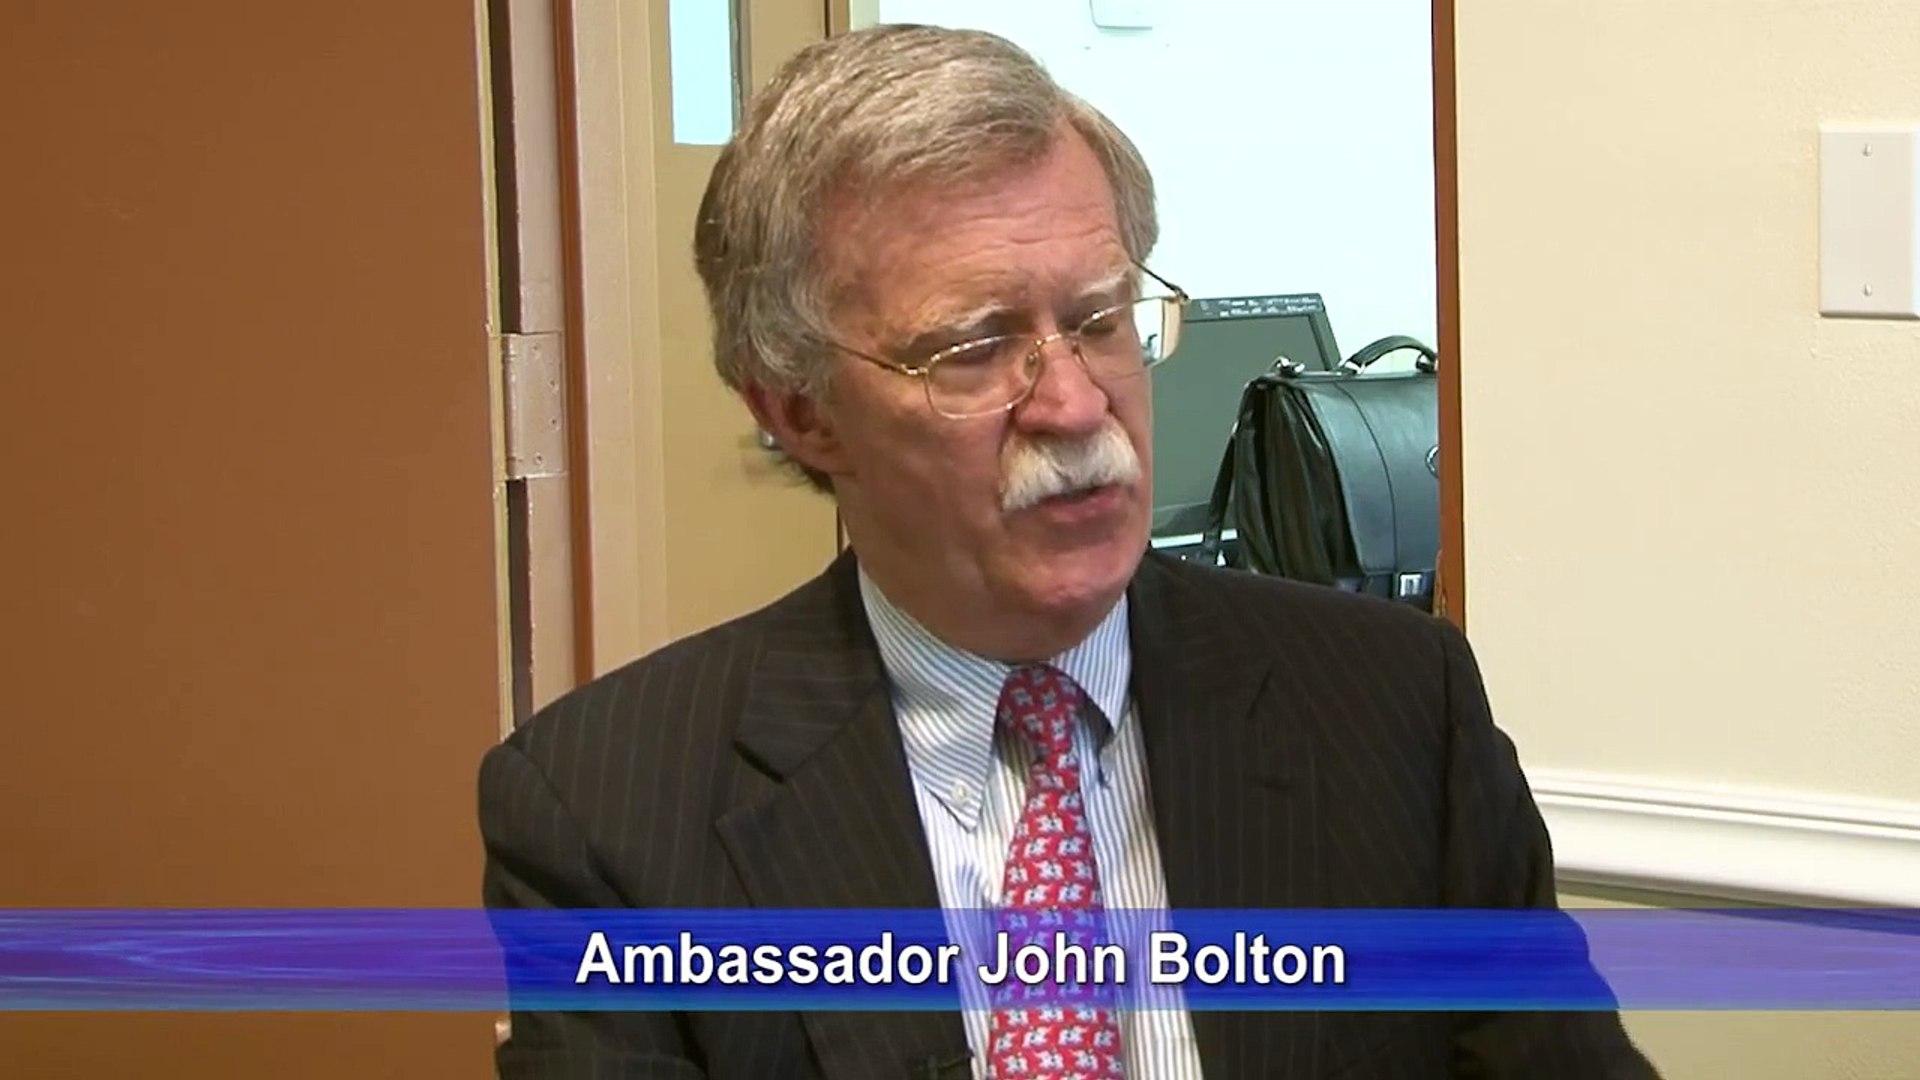 John Bolton with Richard Peritz on Shalom Show 889